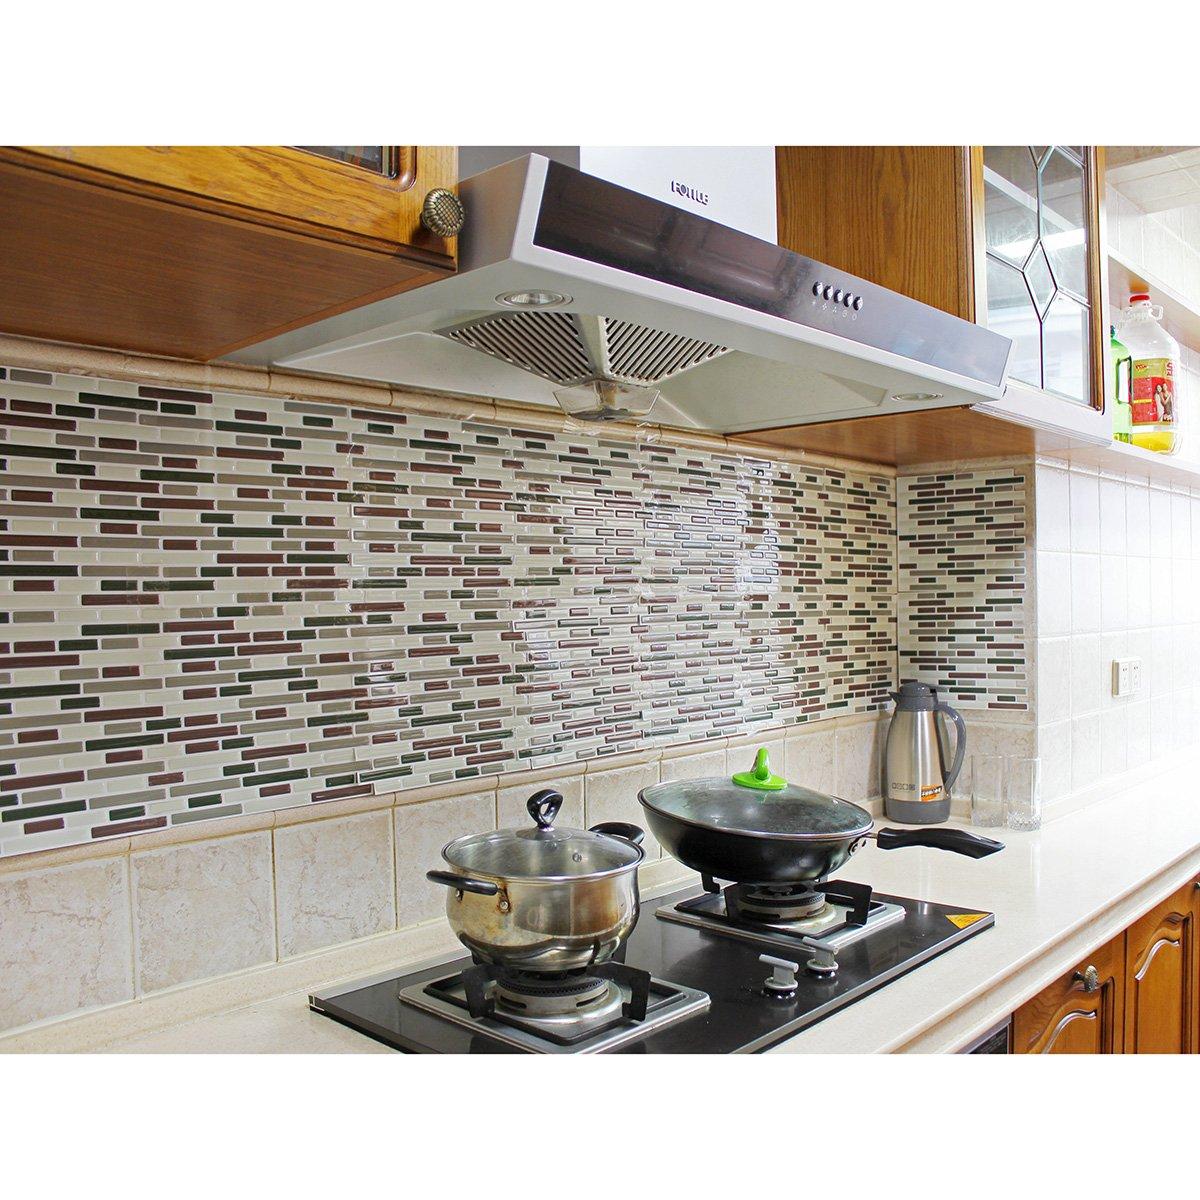 Fancy-fix Vinyl Peel Stick Decorative Backsplash Kitchen